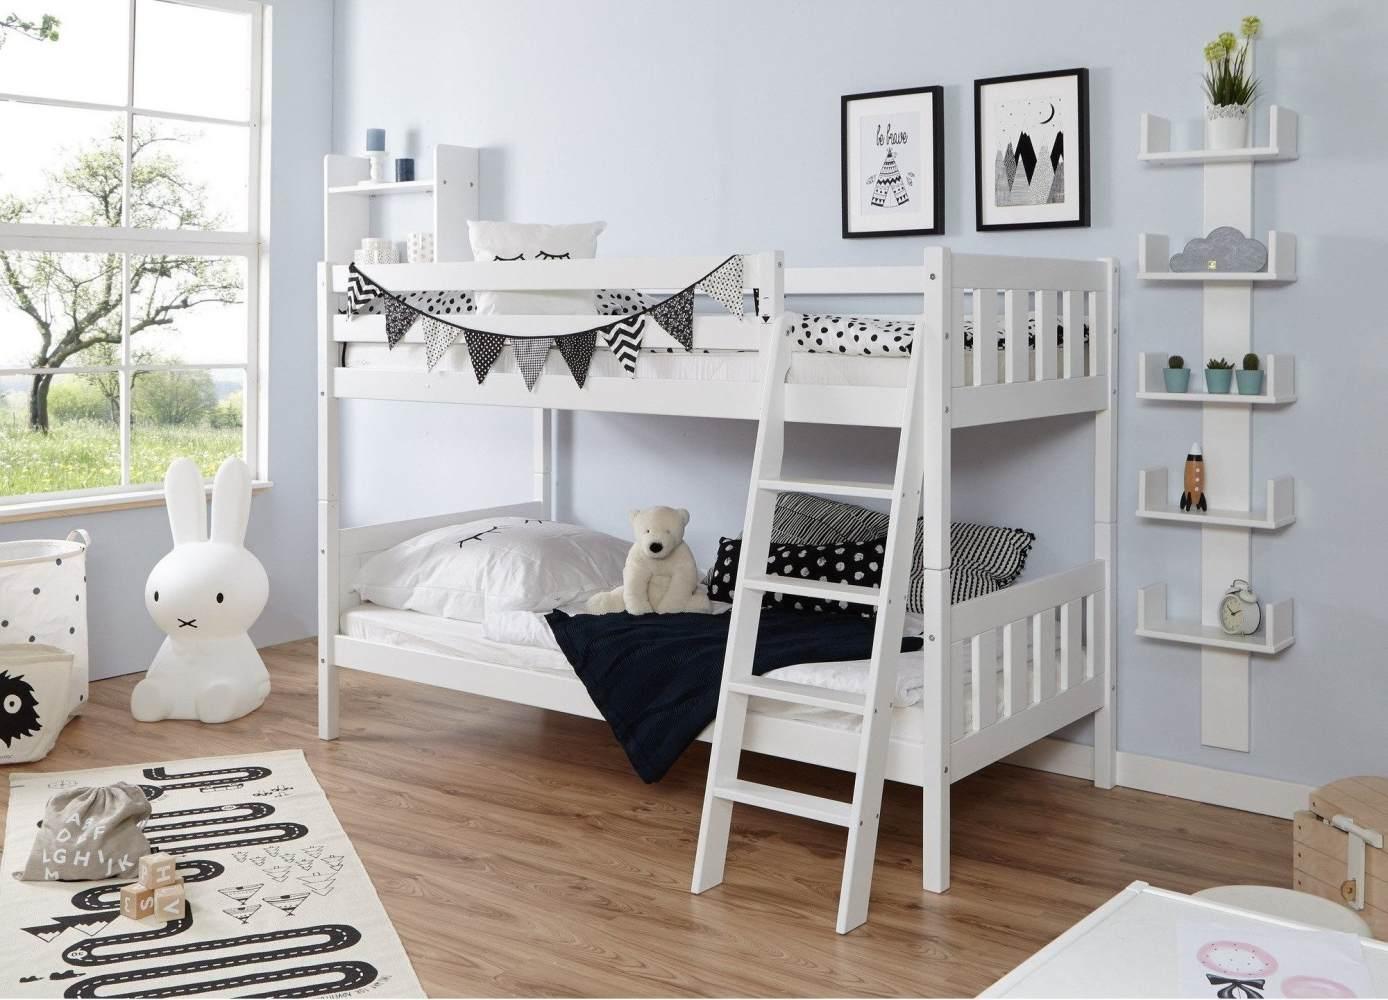 Ticaa 'Erni' Etagenbett Vertikal Buche Weiß Bild 1